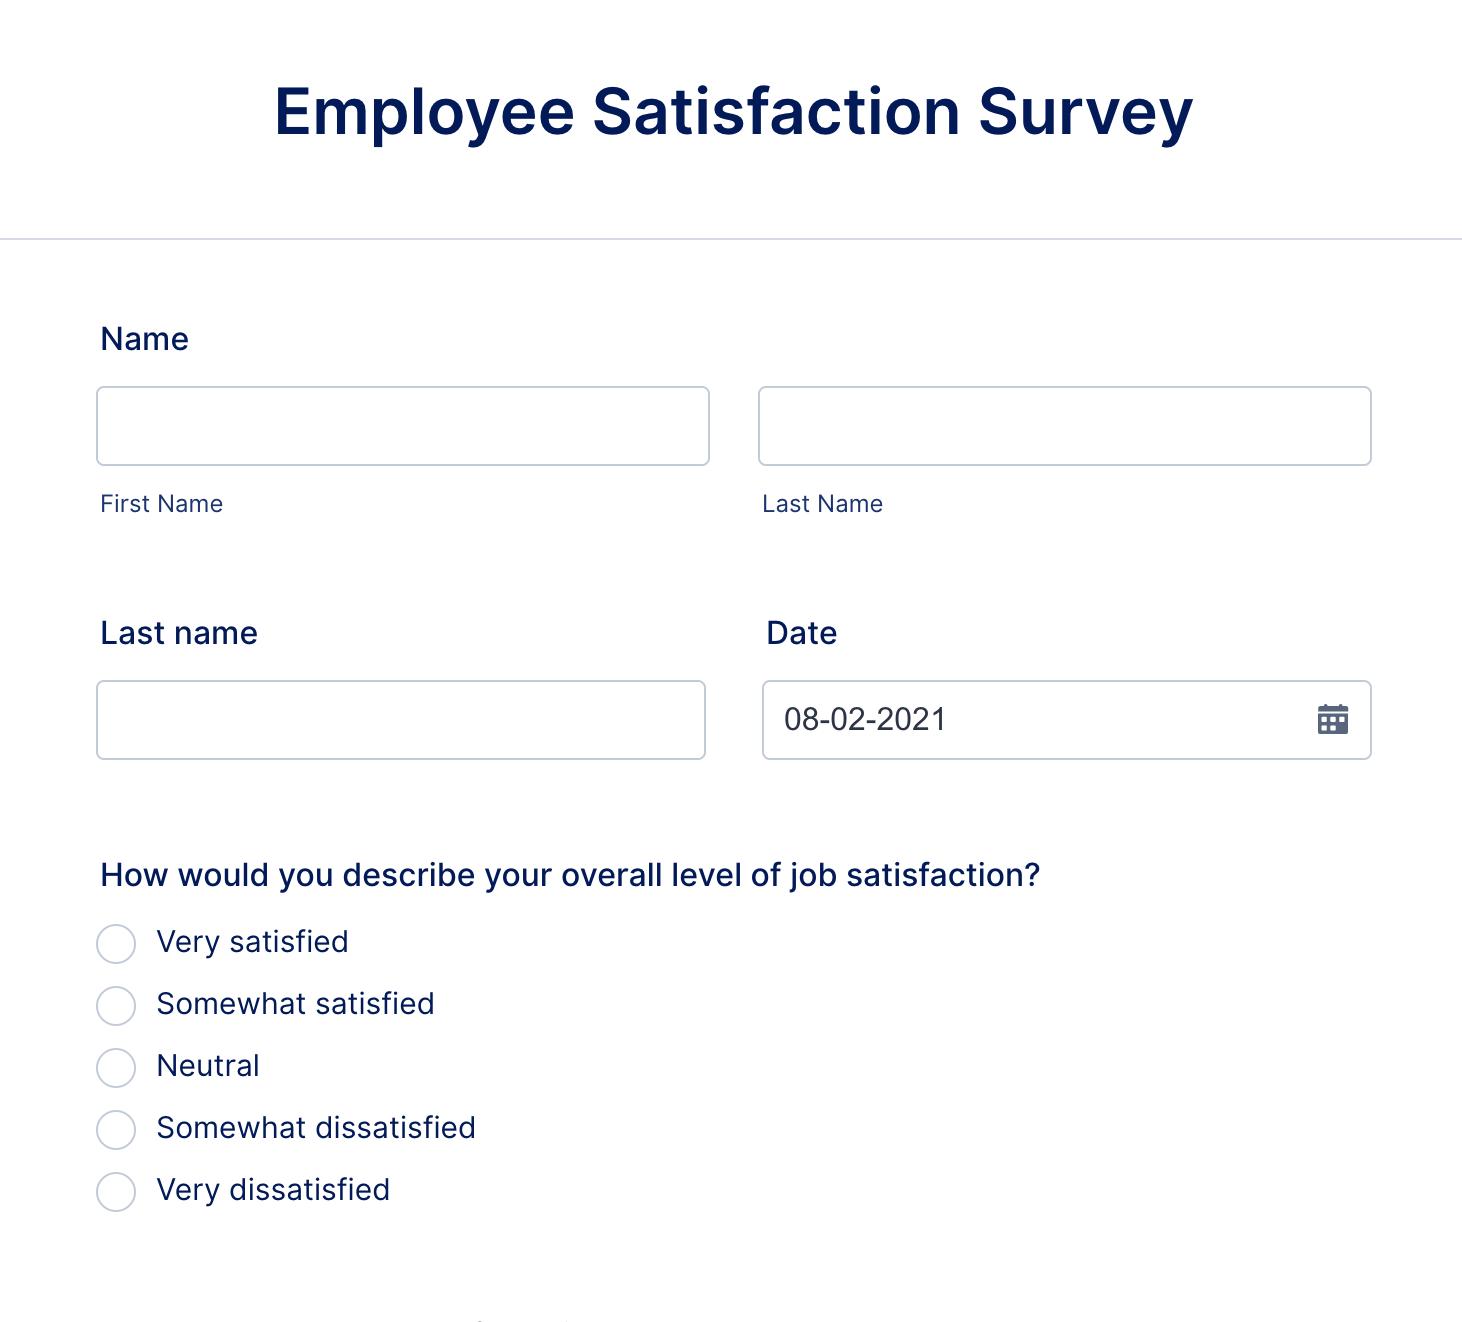 Employee Satisfaction Survey Form Template